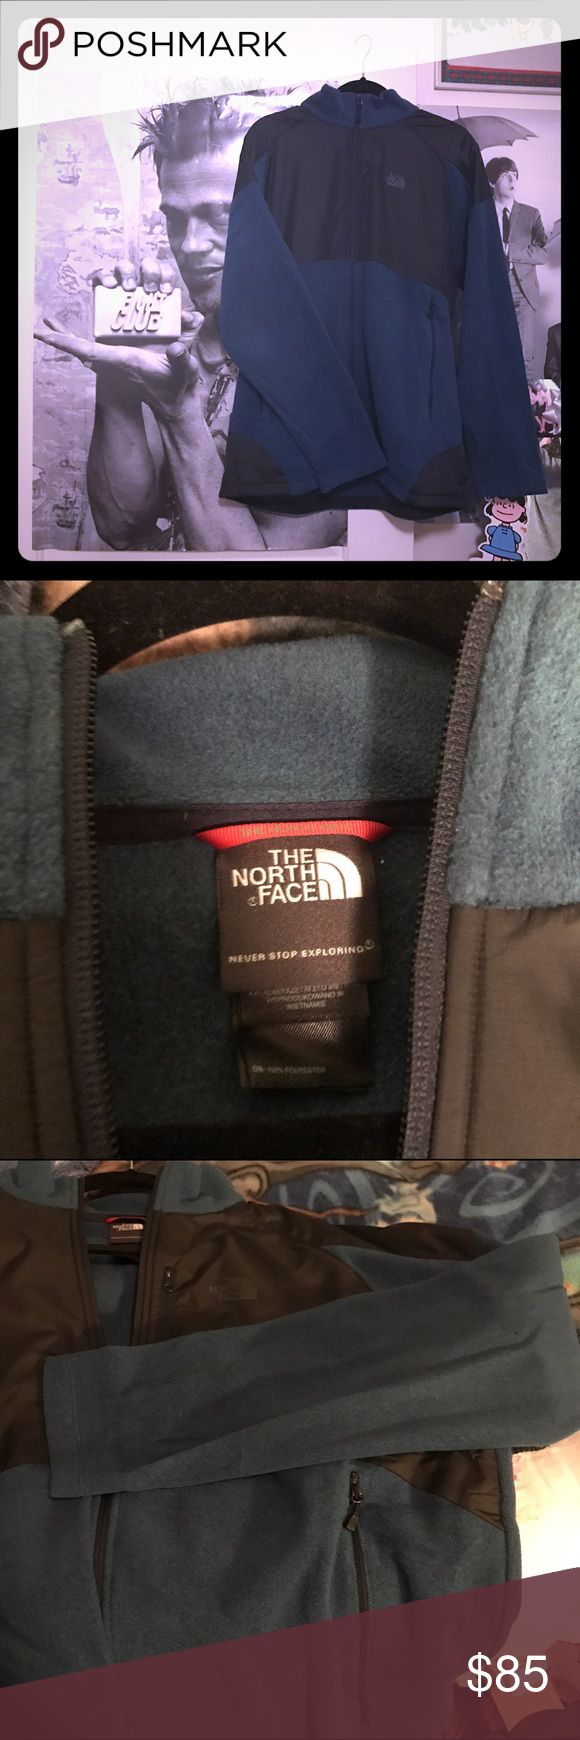 North Face Denali Men's Fleece jacket Like new! Dark teal fleece and black waterproof material. North Face Jackets & Coats Windbreakers